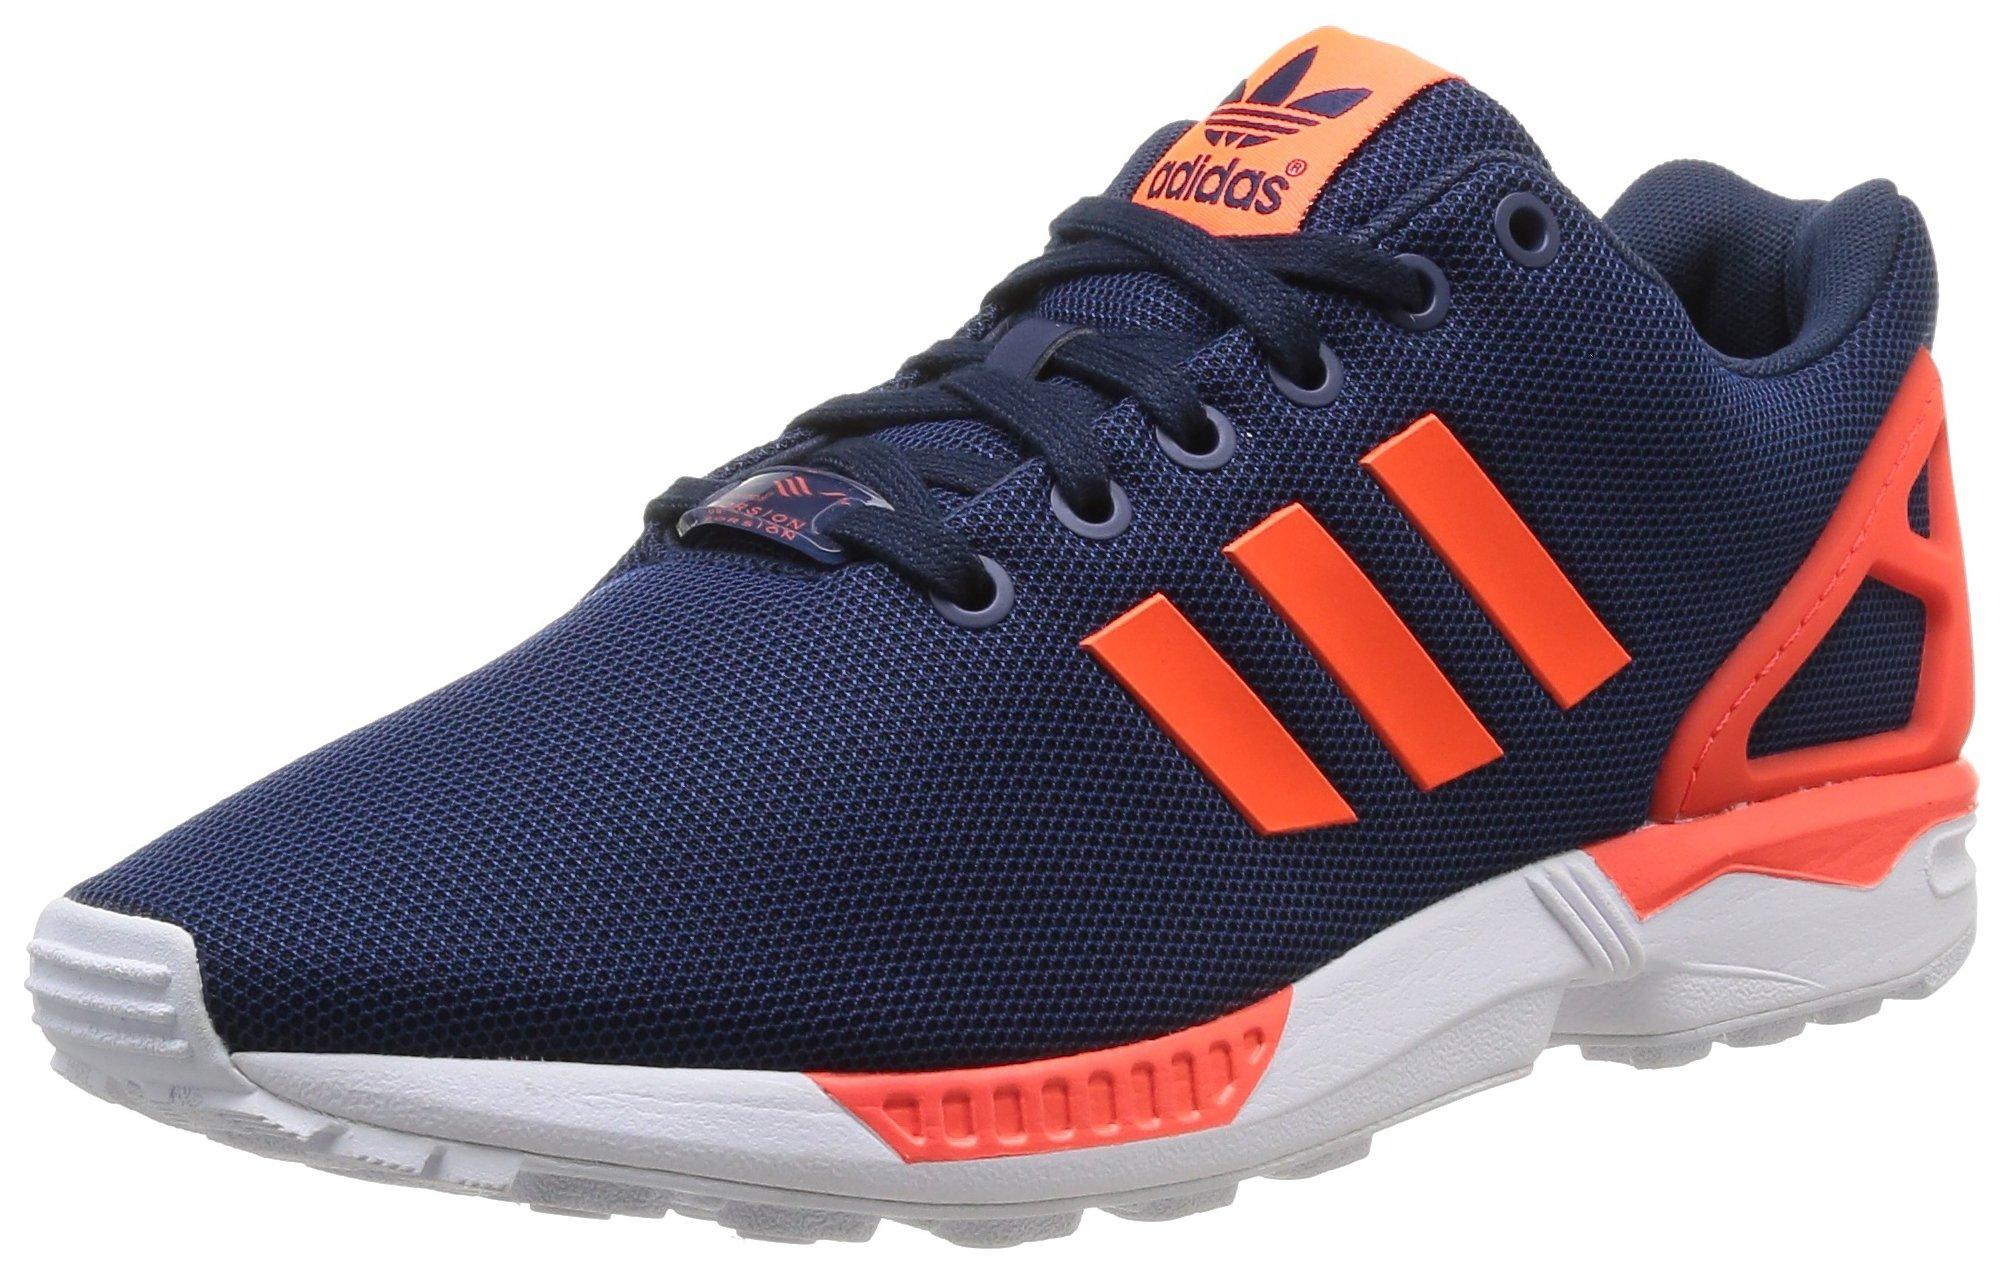 adidas Men's Zx Flux 45 1|3 Blue- Buy